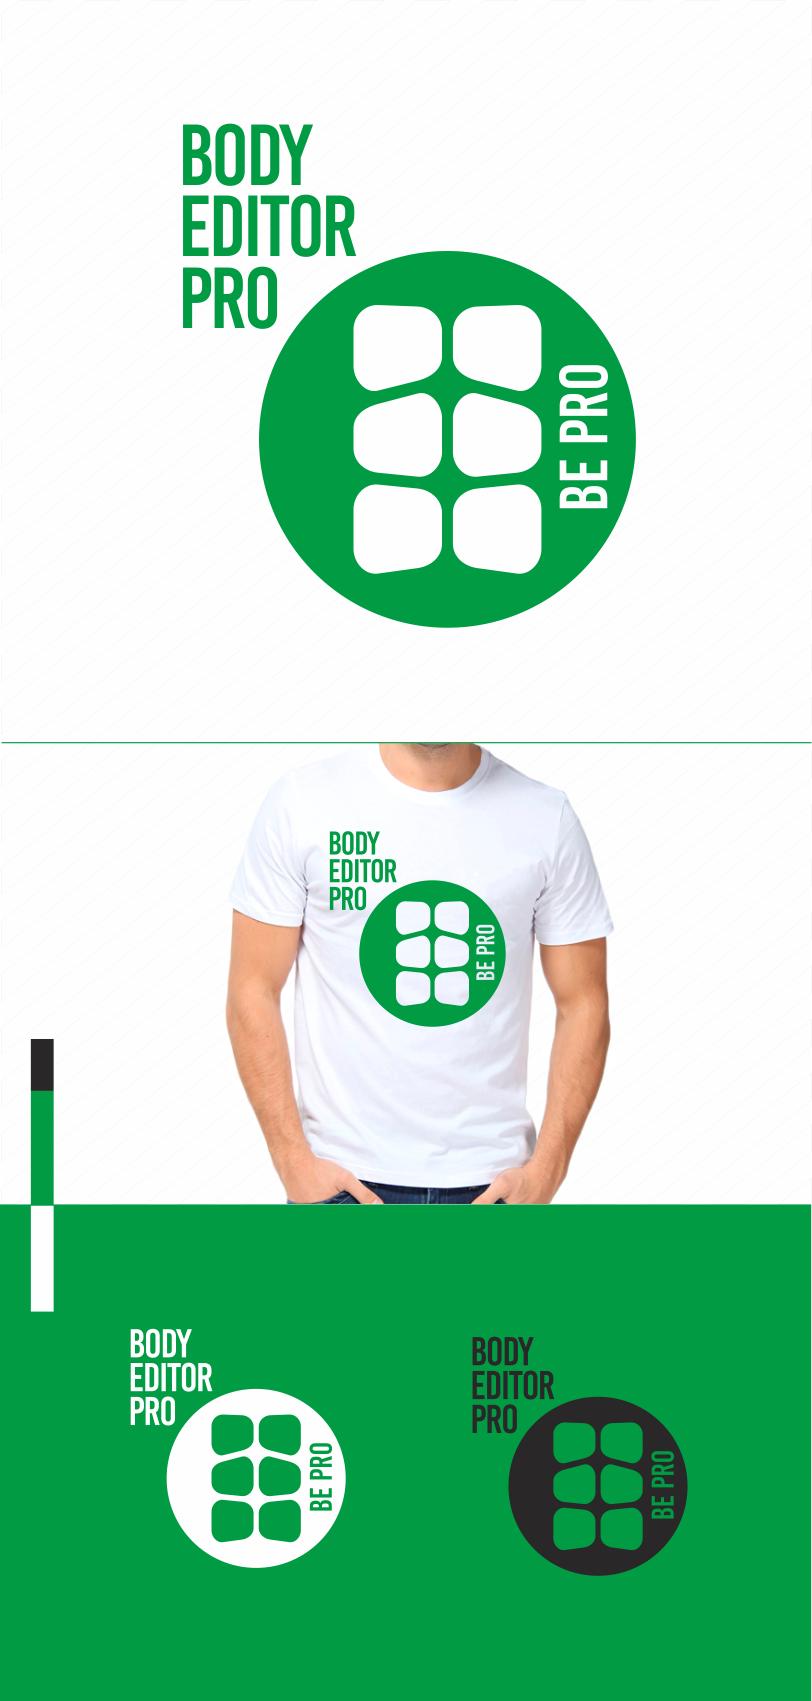 Лого+символ для марки Спортивного питания фото f_576596881b045c82.png